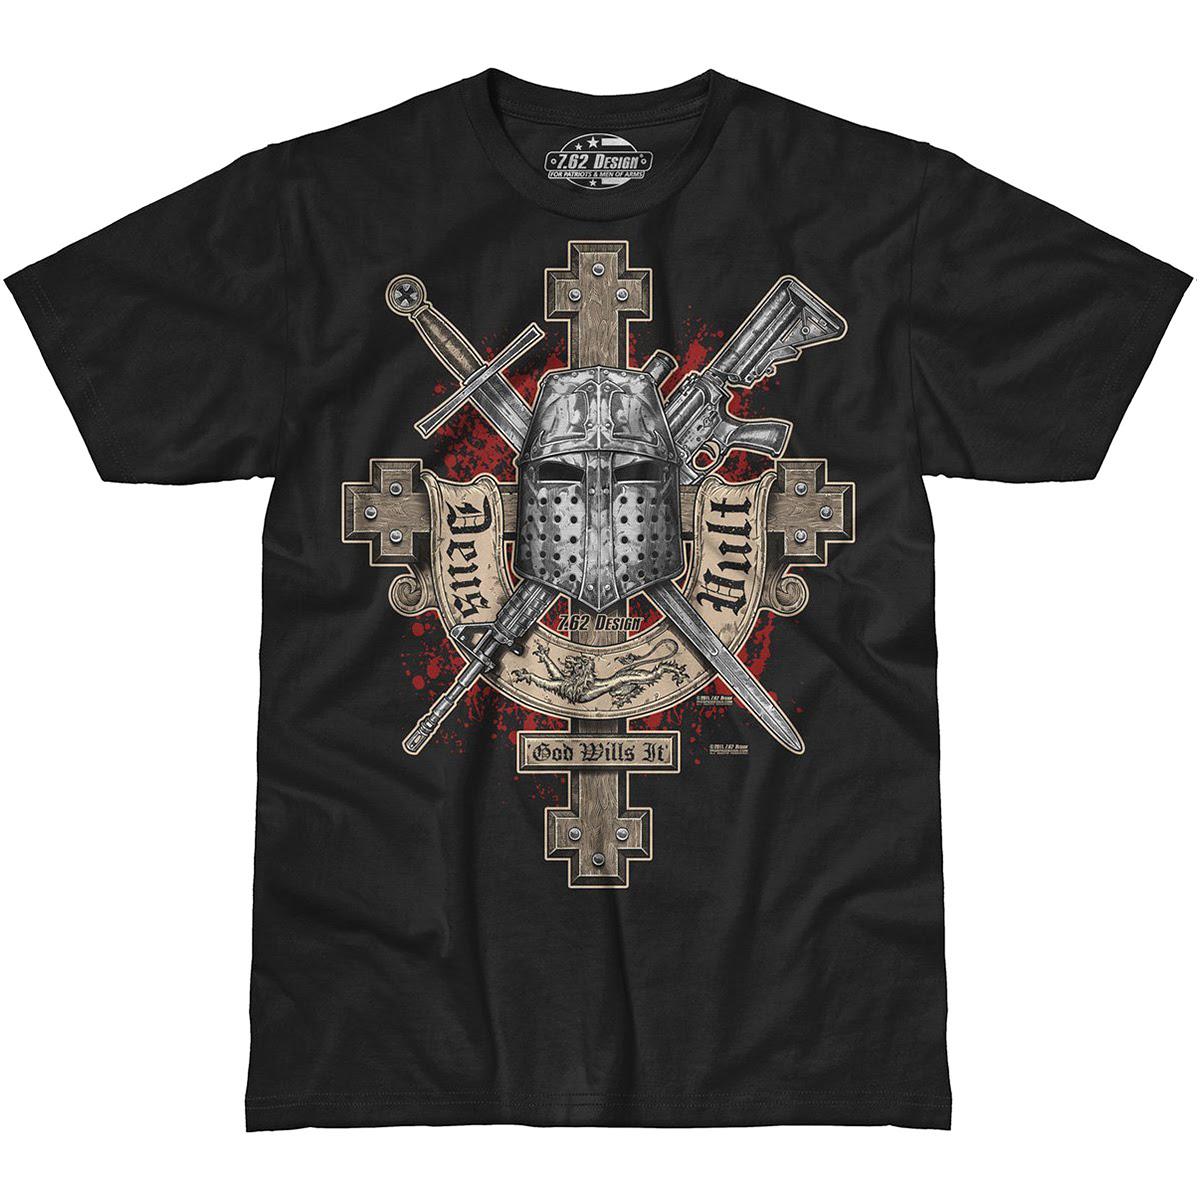 7.62 Design Deus Vult T-Shirt Black   7.62 Design ...